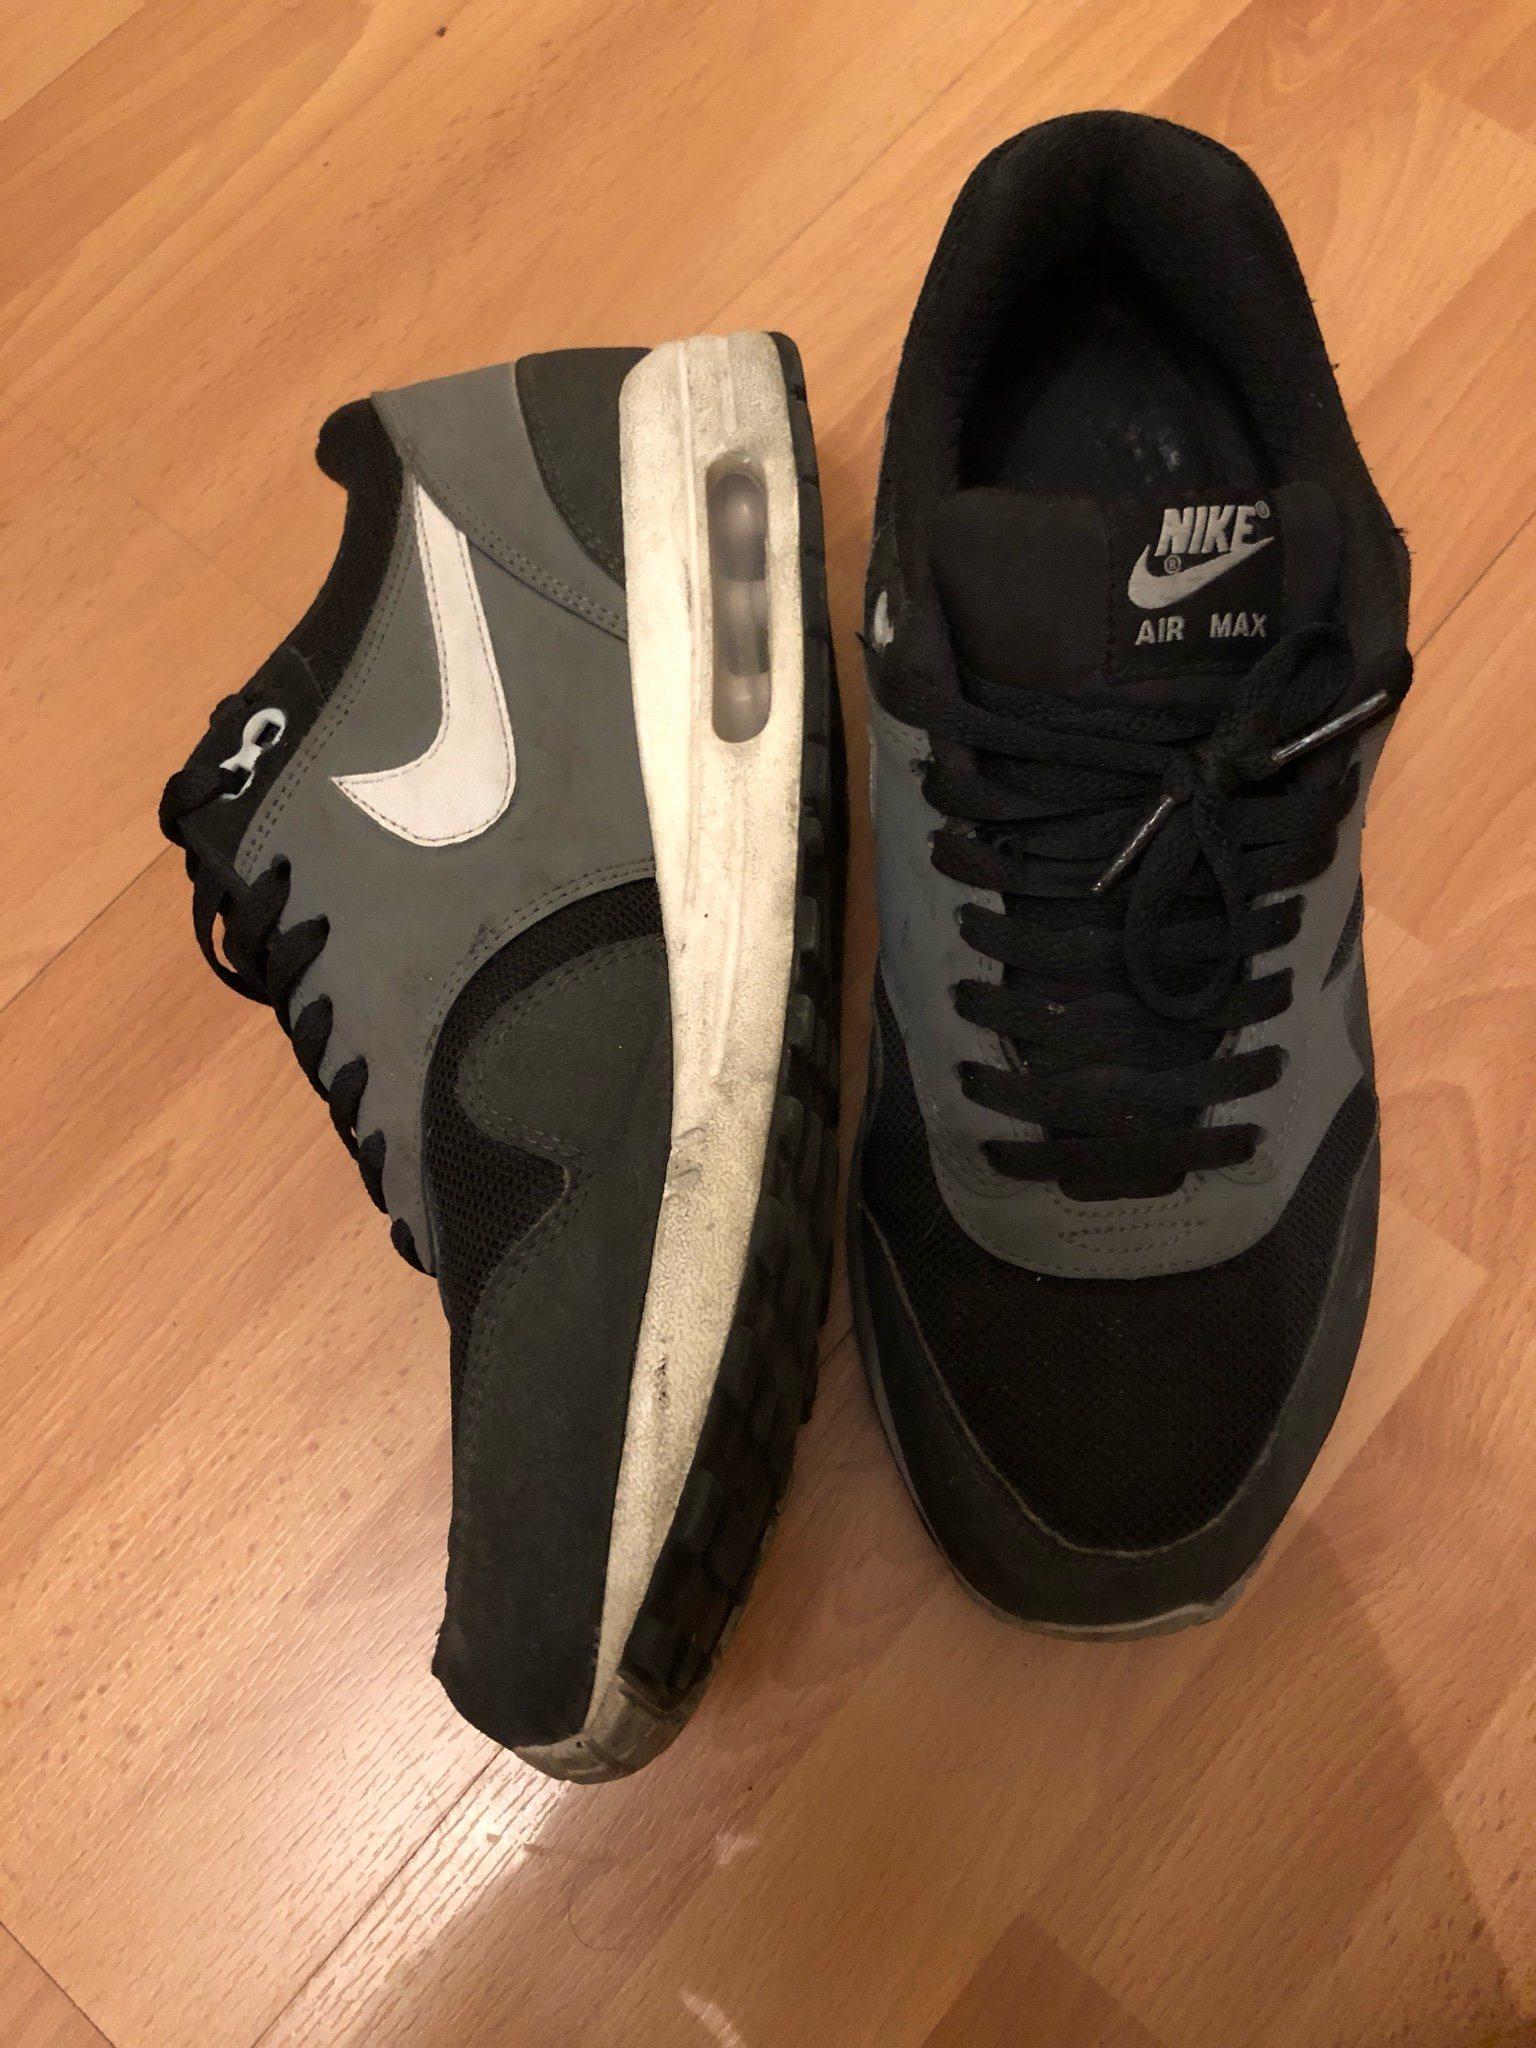 buy popular 85a3e 7baf9 Nike air max 1 44 sneakers